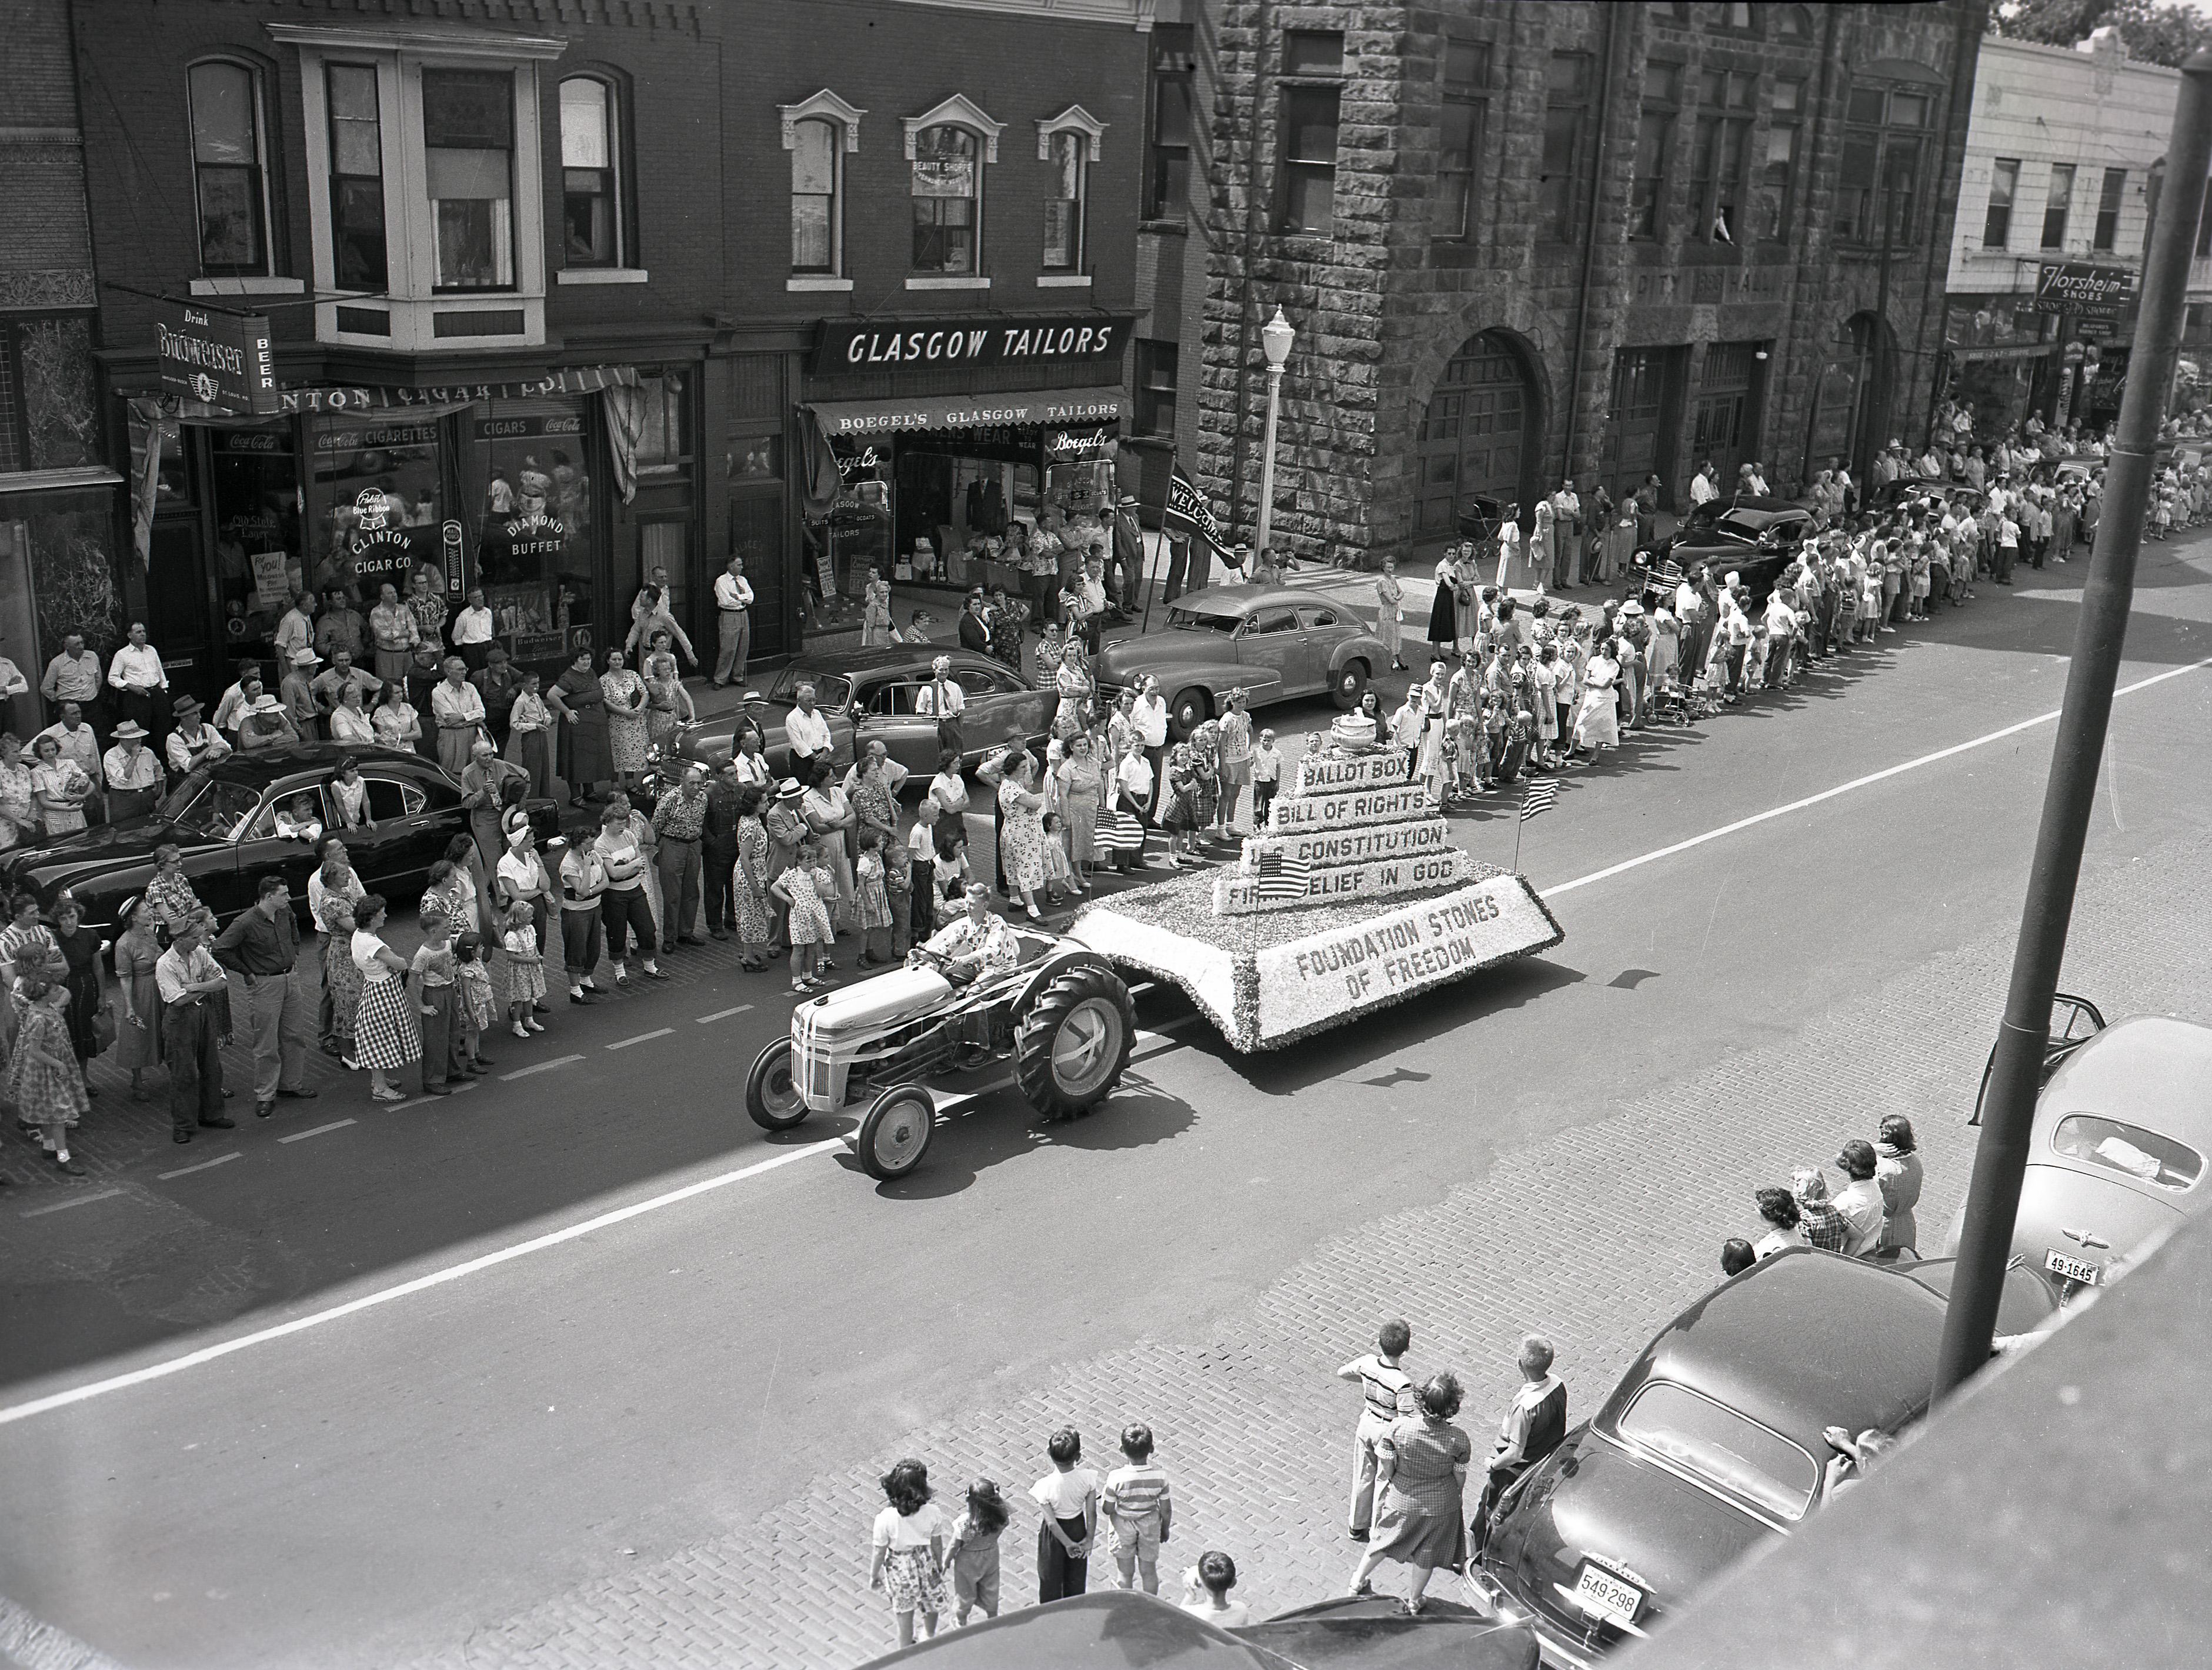 City_Hall_Circa_1952.jpg